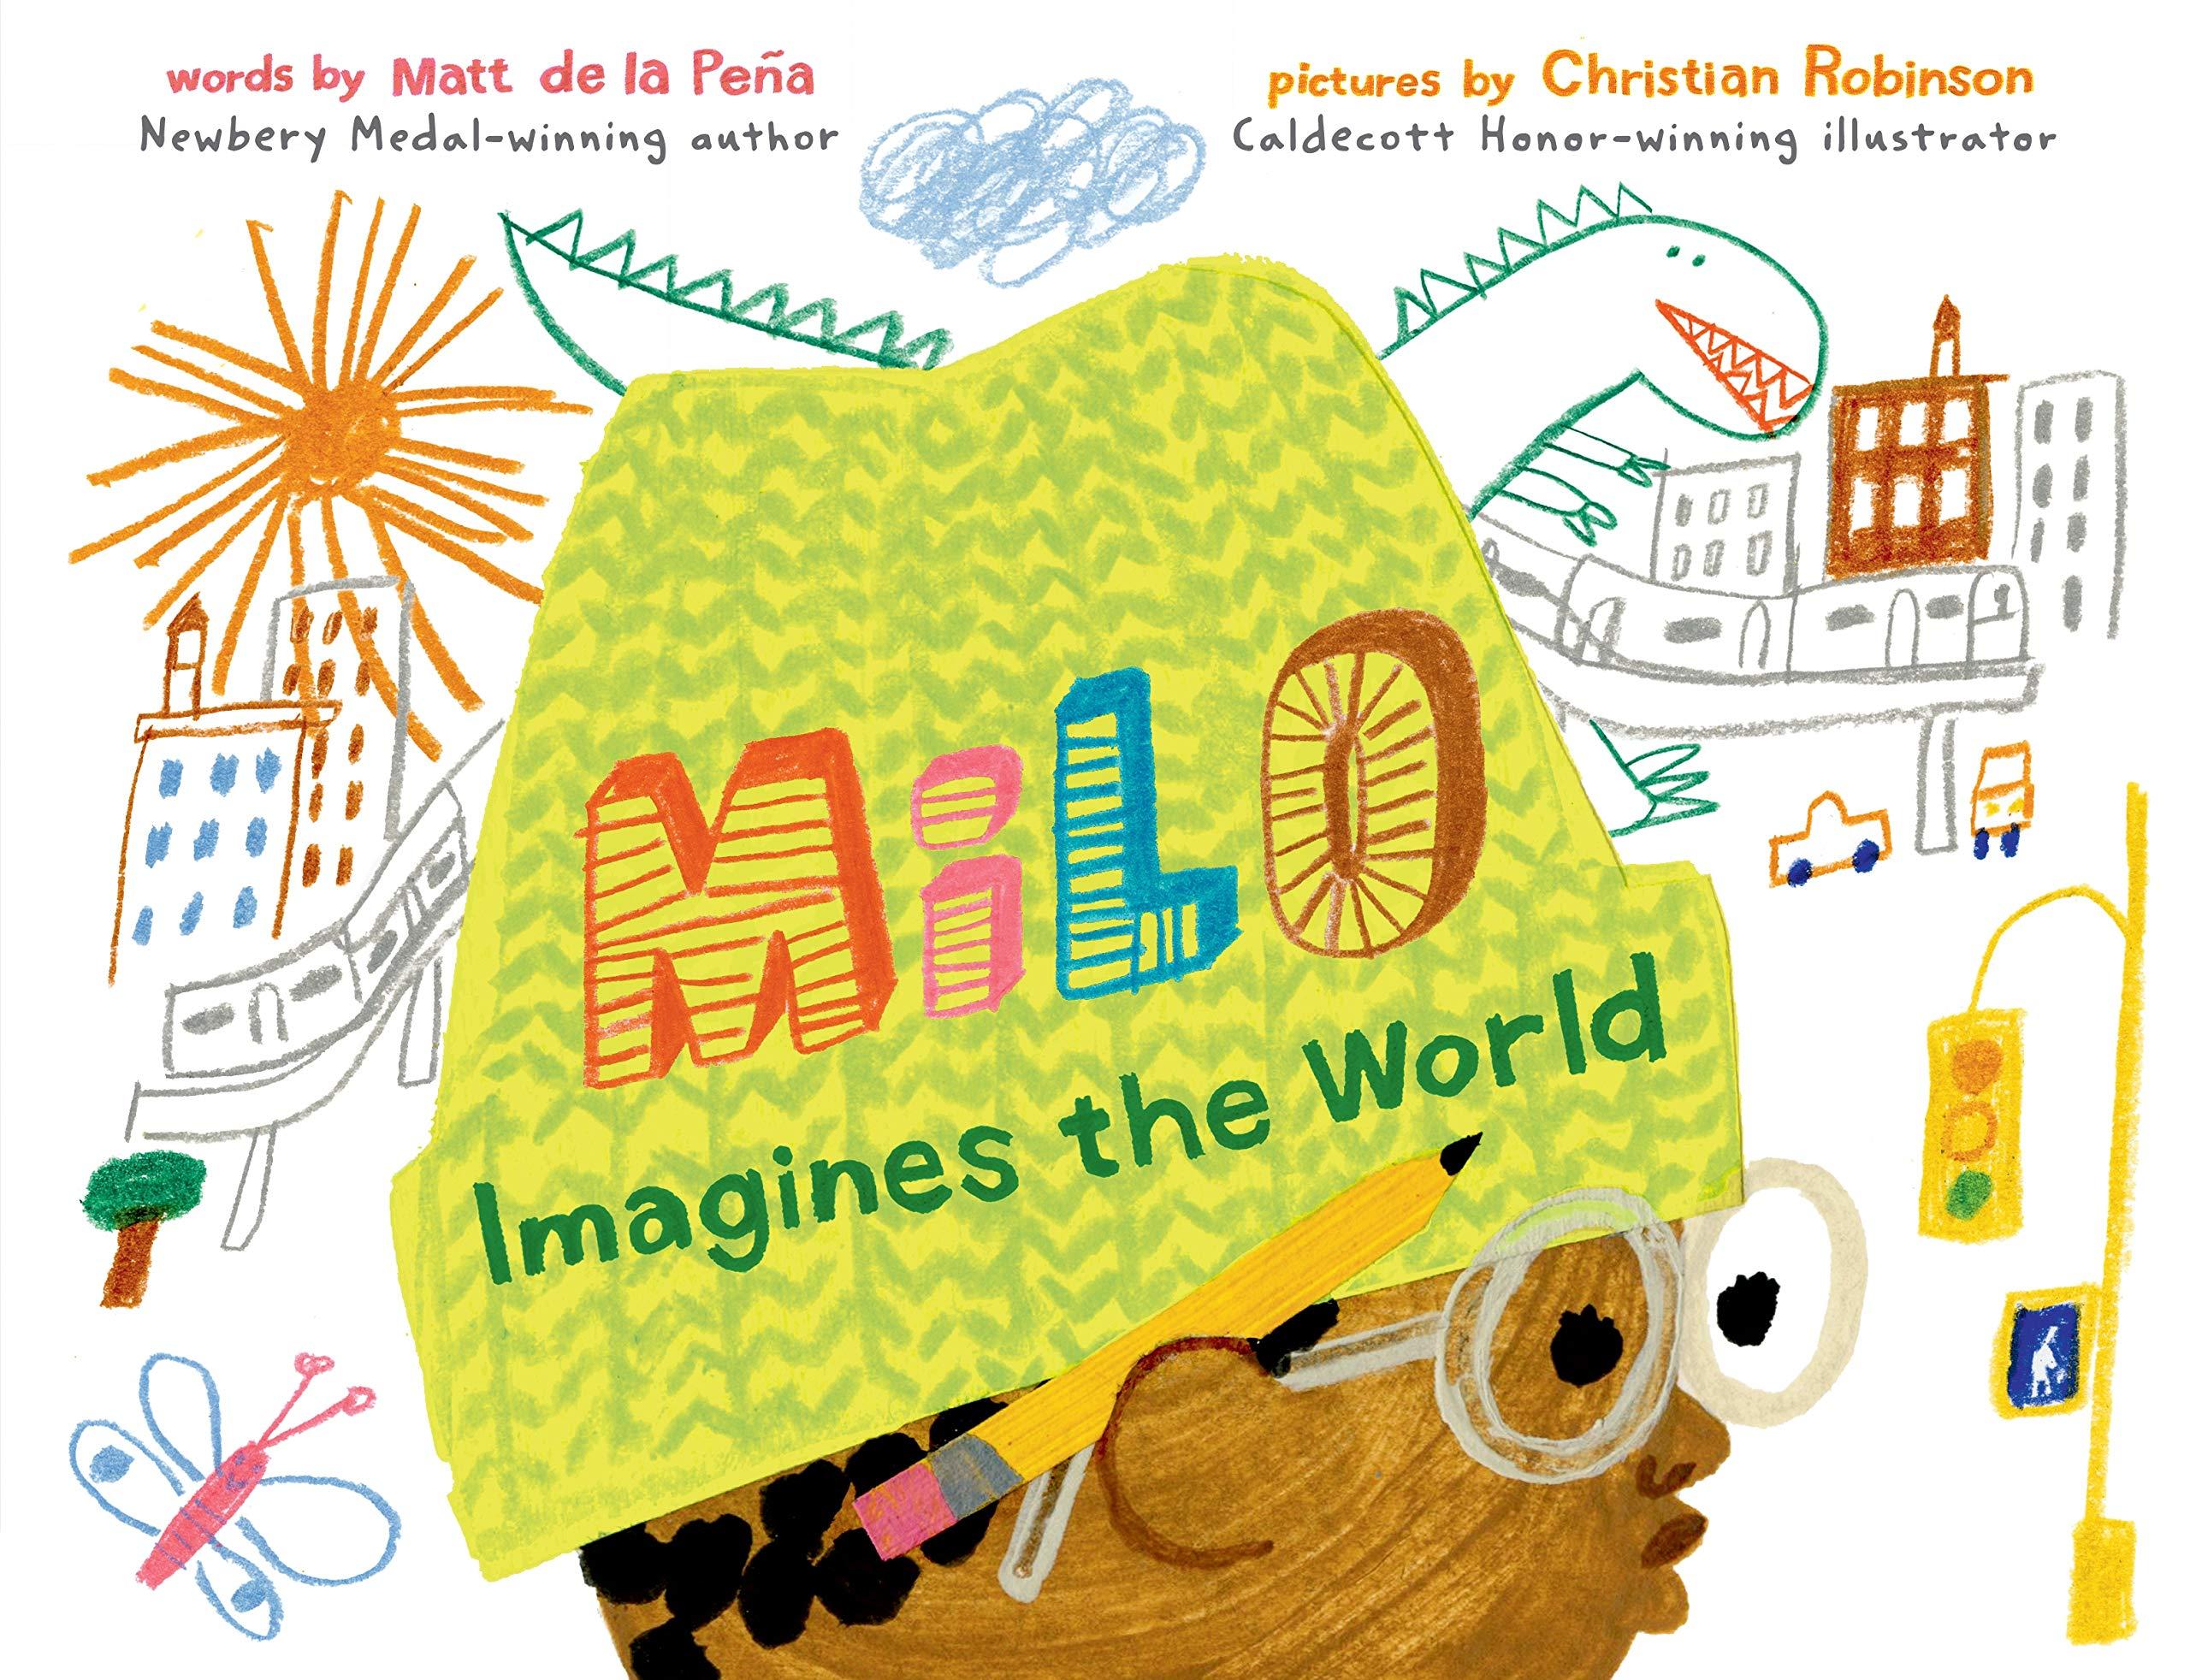 milo_imagines_the_world